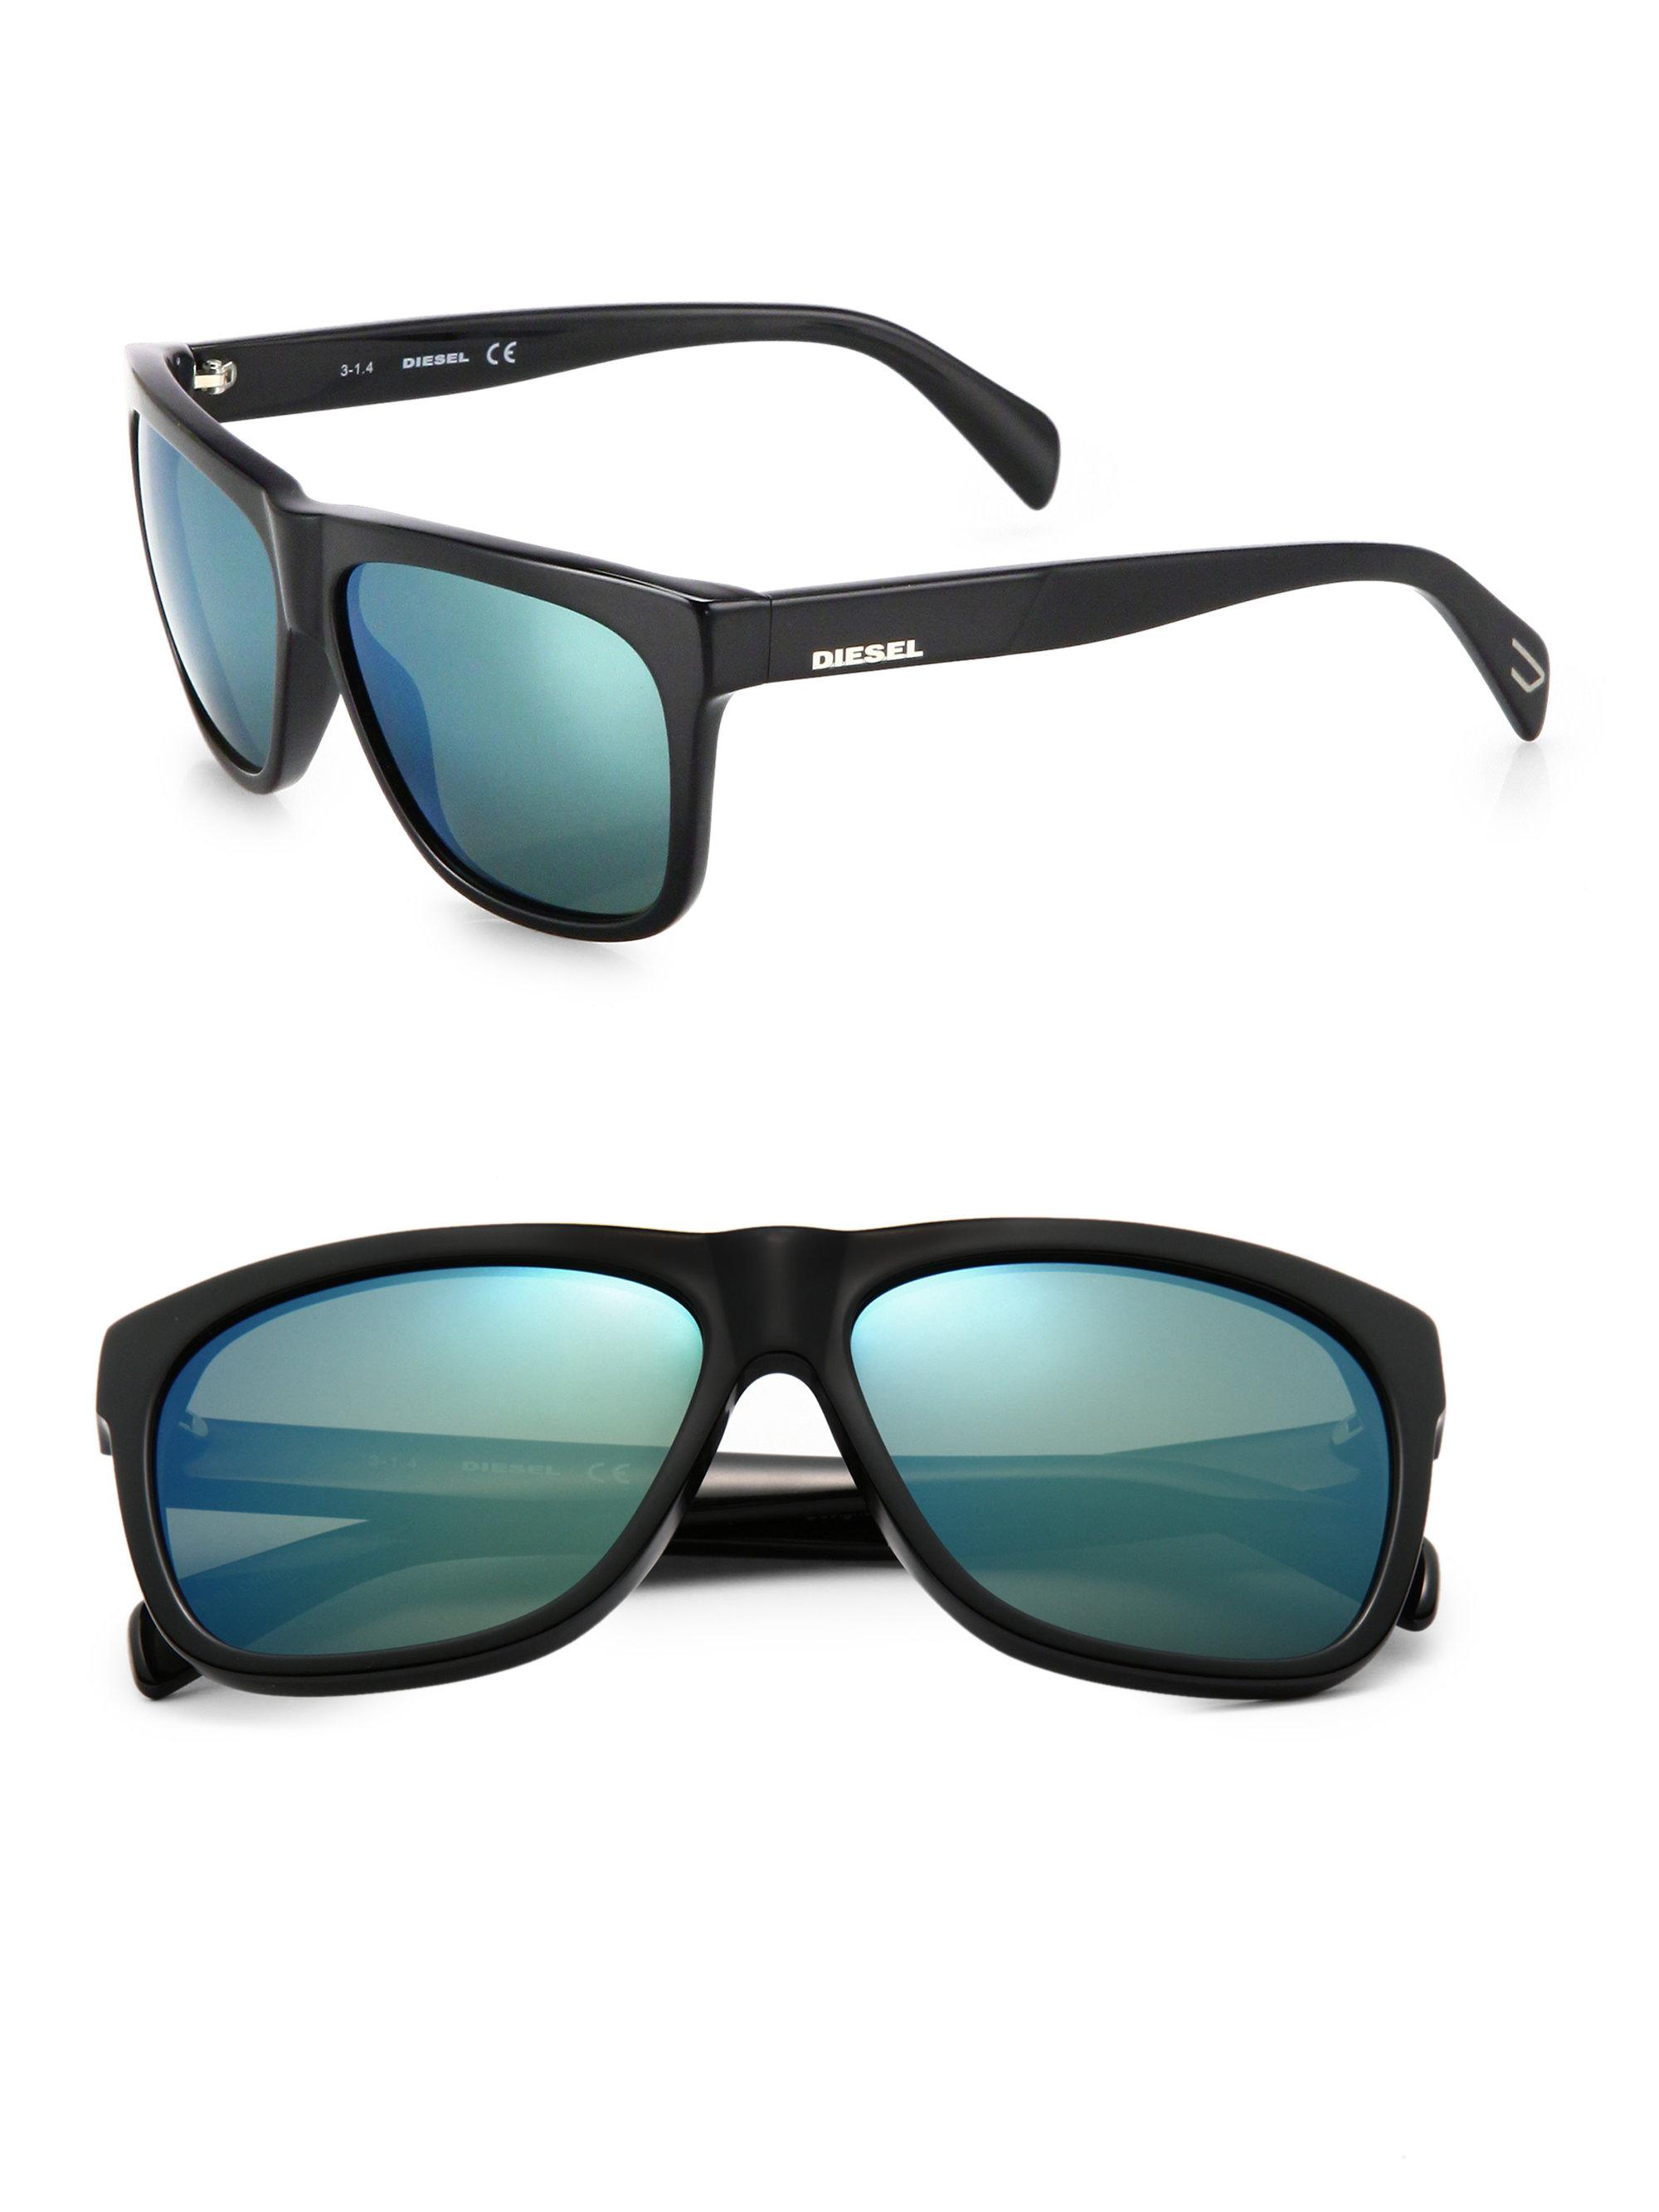 5c4ec03b8f Lyst - DIESEL 58Mm Wayfarer Sunglasses in Black for Men